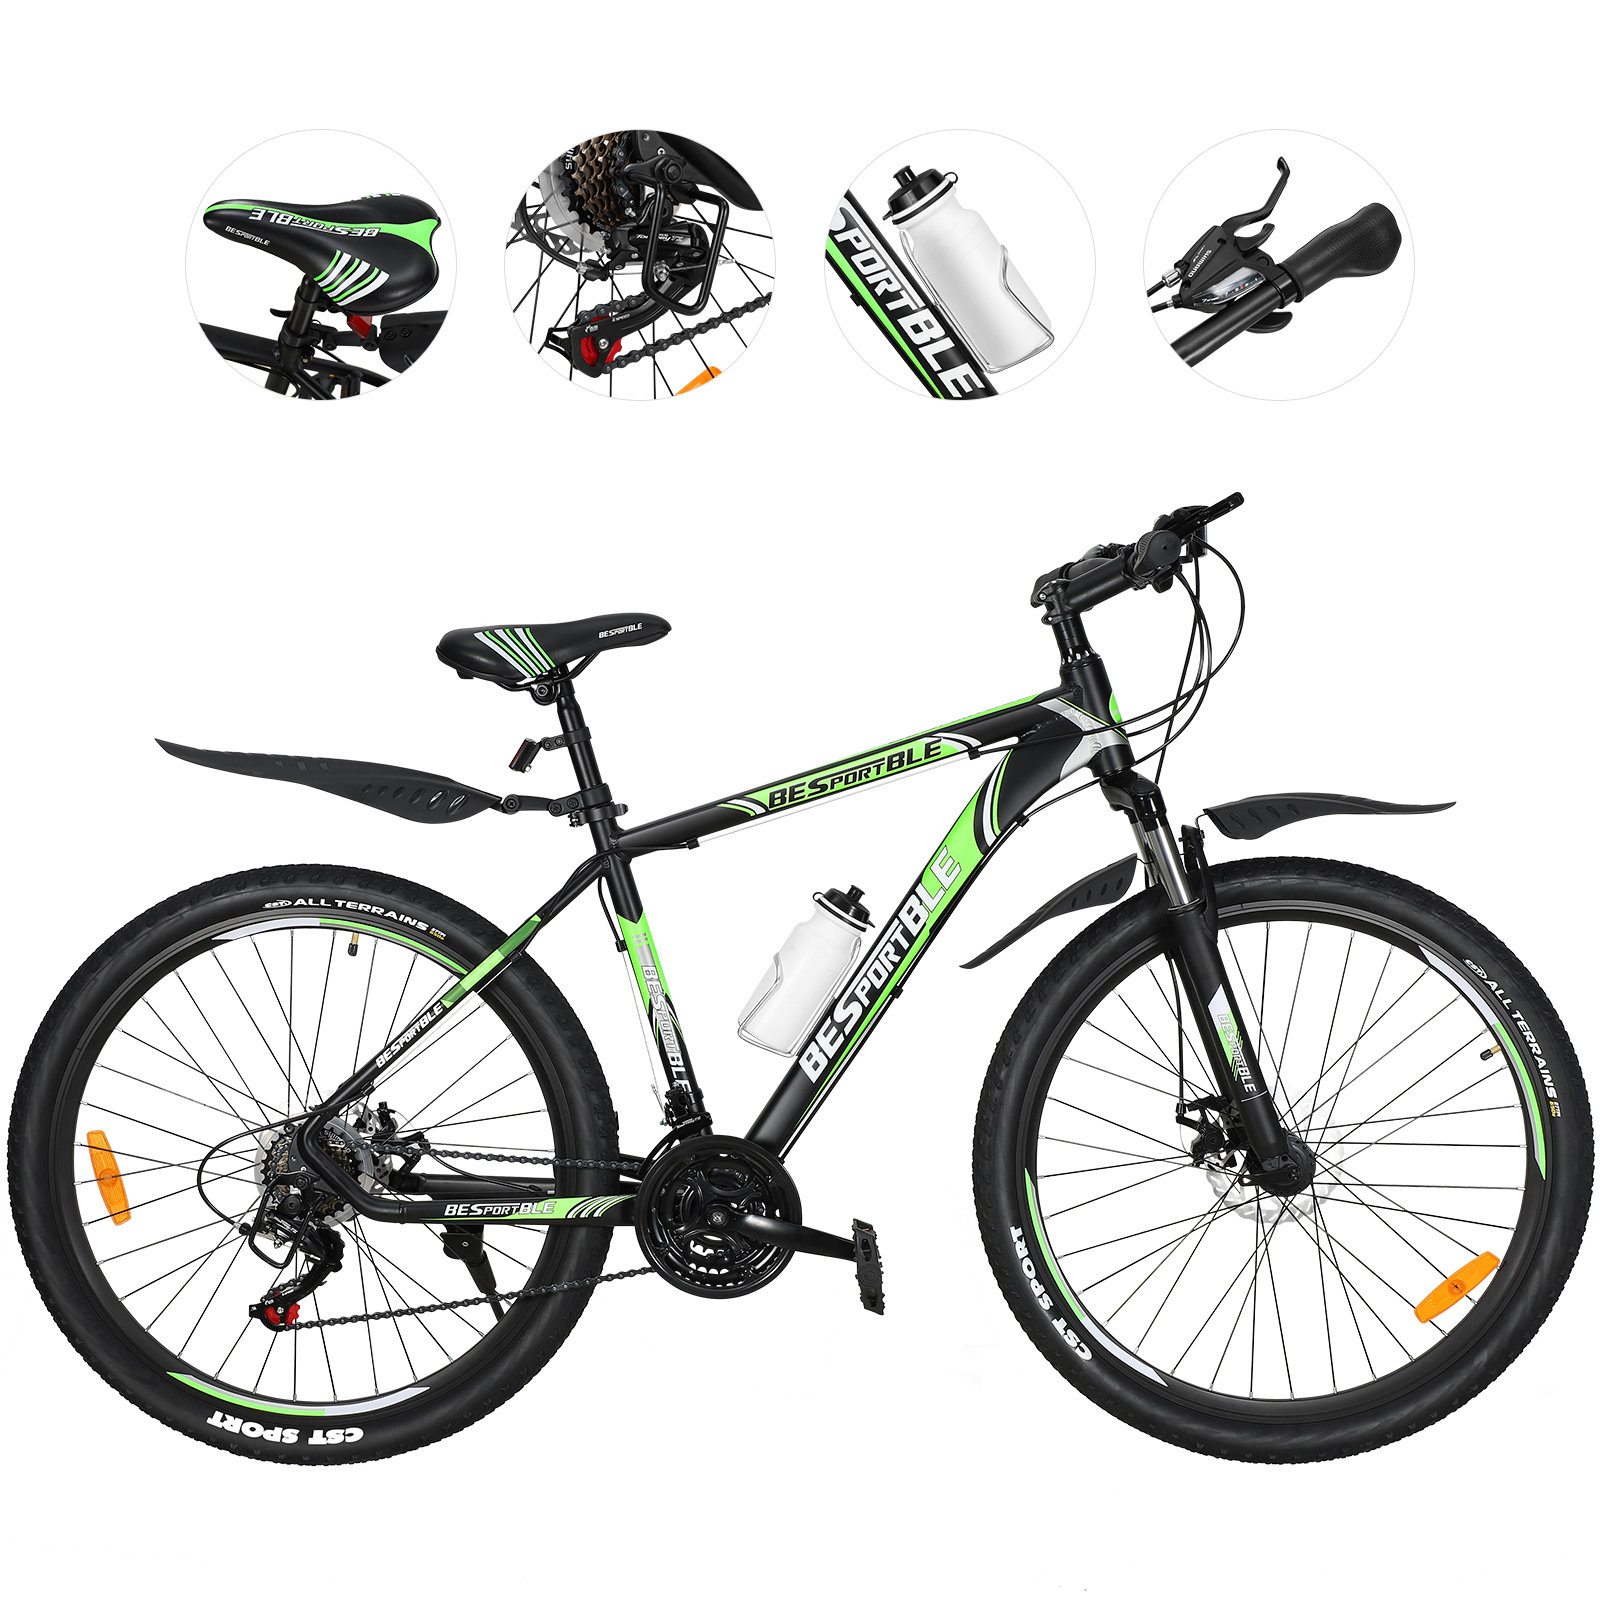 "BESPORTBLE 27.5"" Wheel 21 Speeds Mountain Bike with Aluminum Frame Suspension Fork"